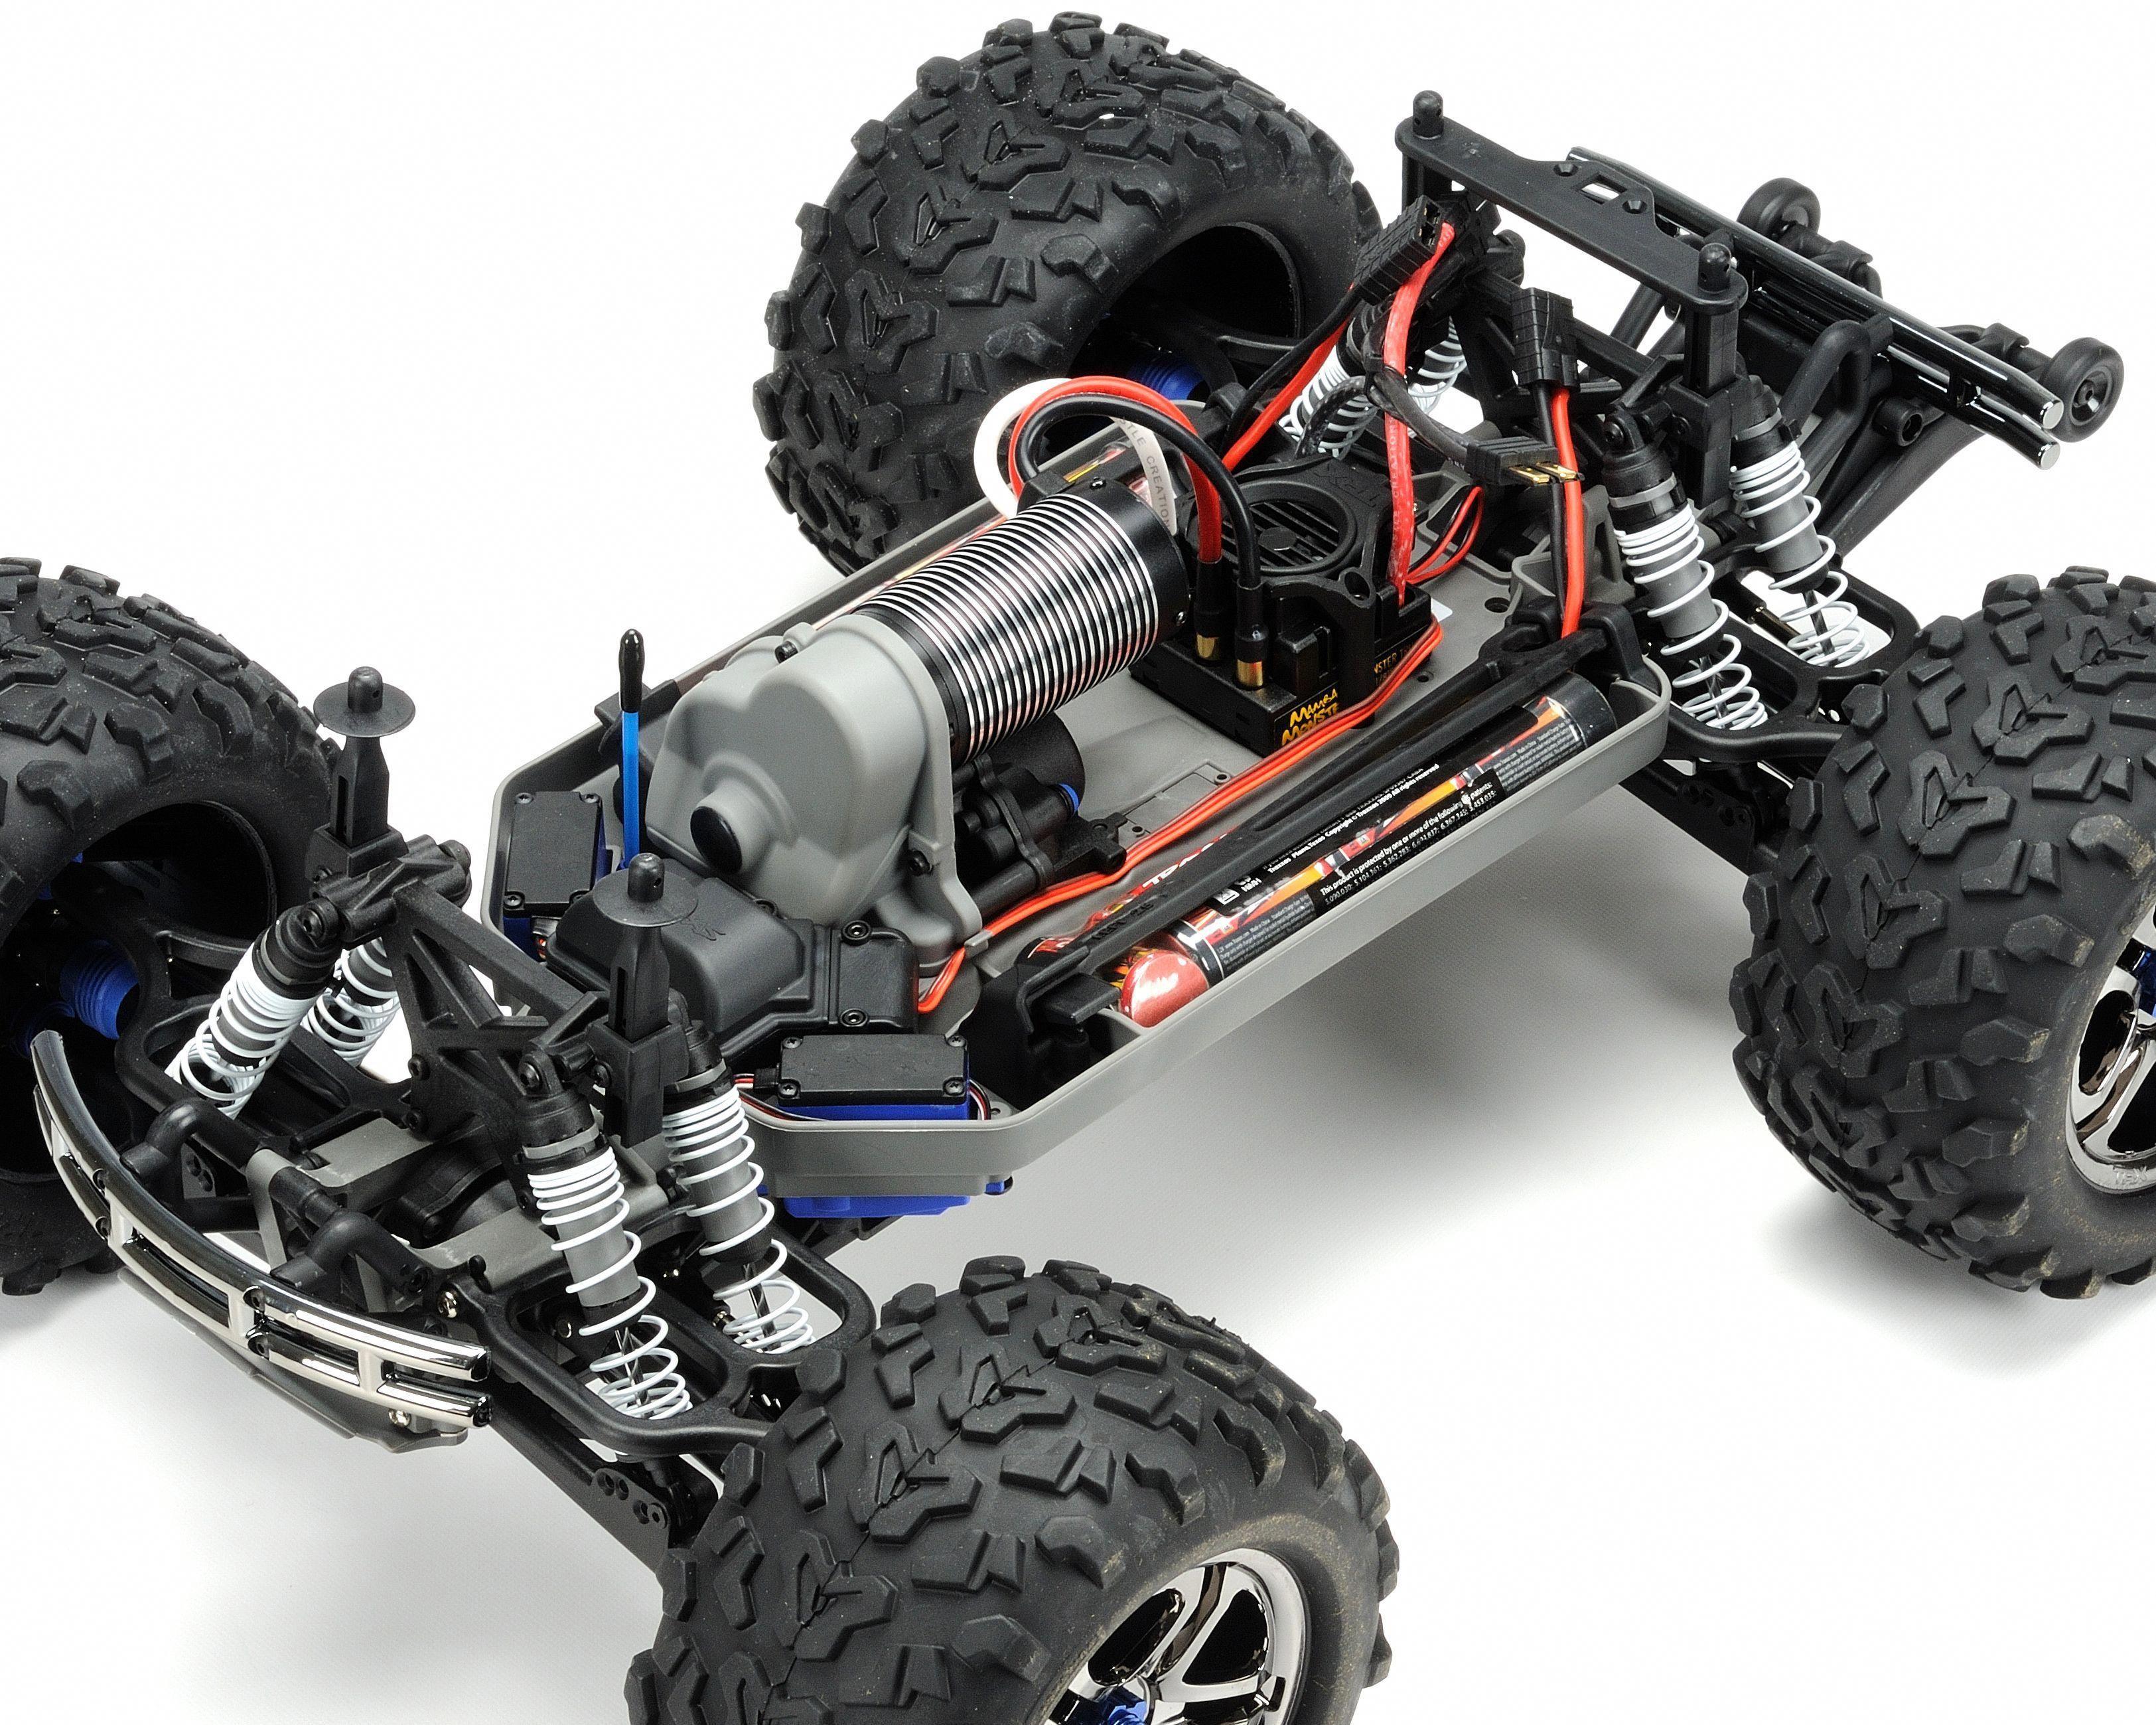 Traxxas EMaxx Brushless RTR Monster Truck w/TQi 2.4GHz